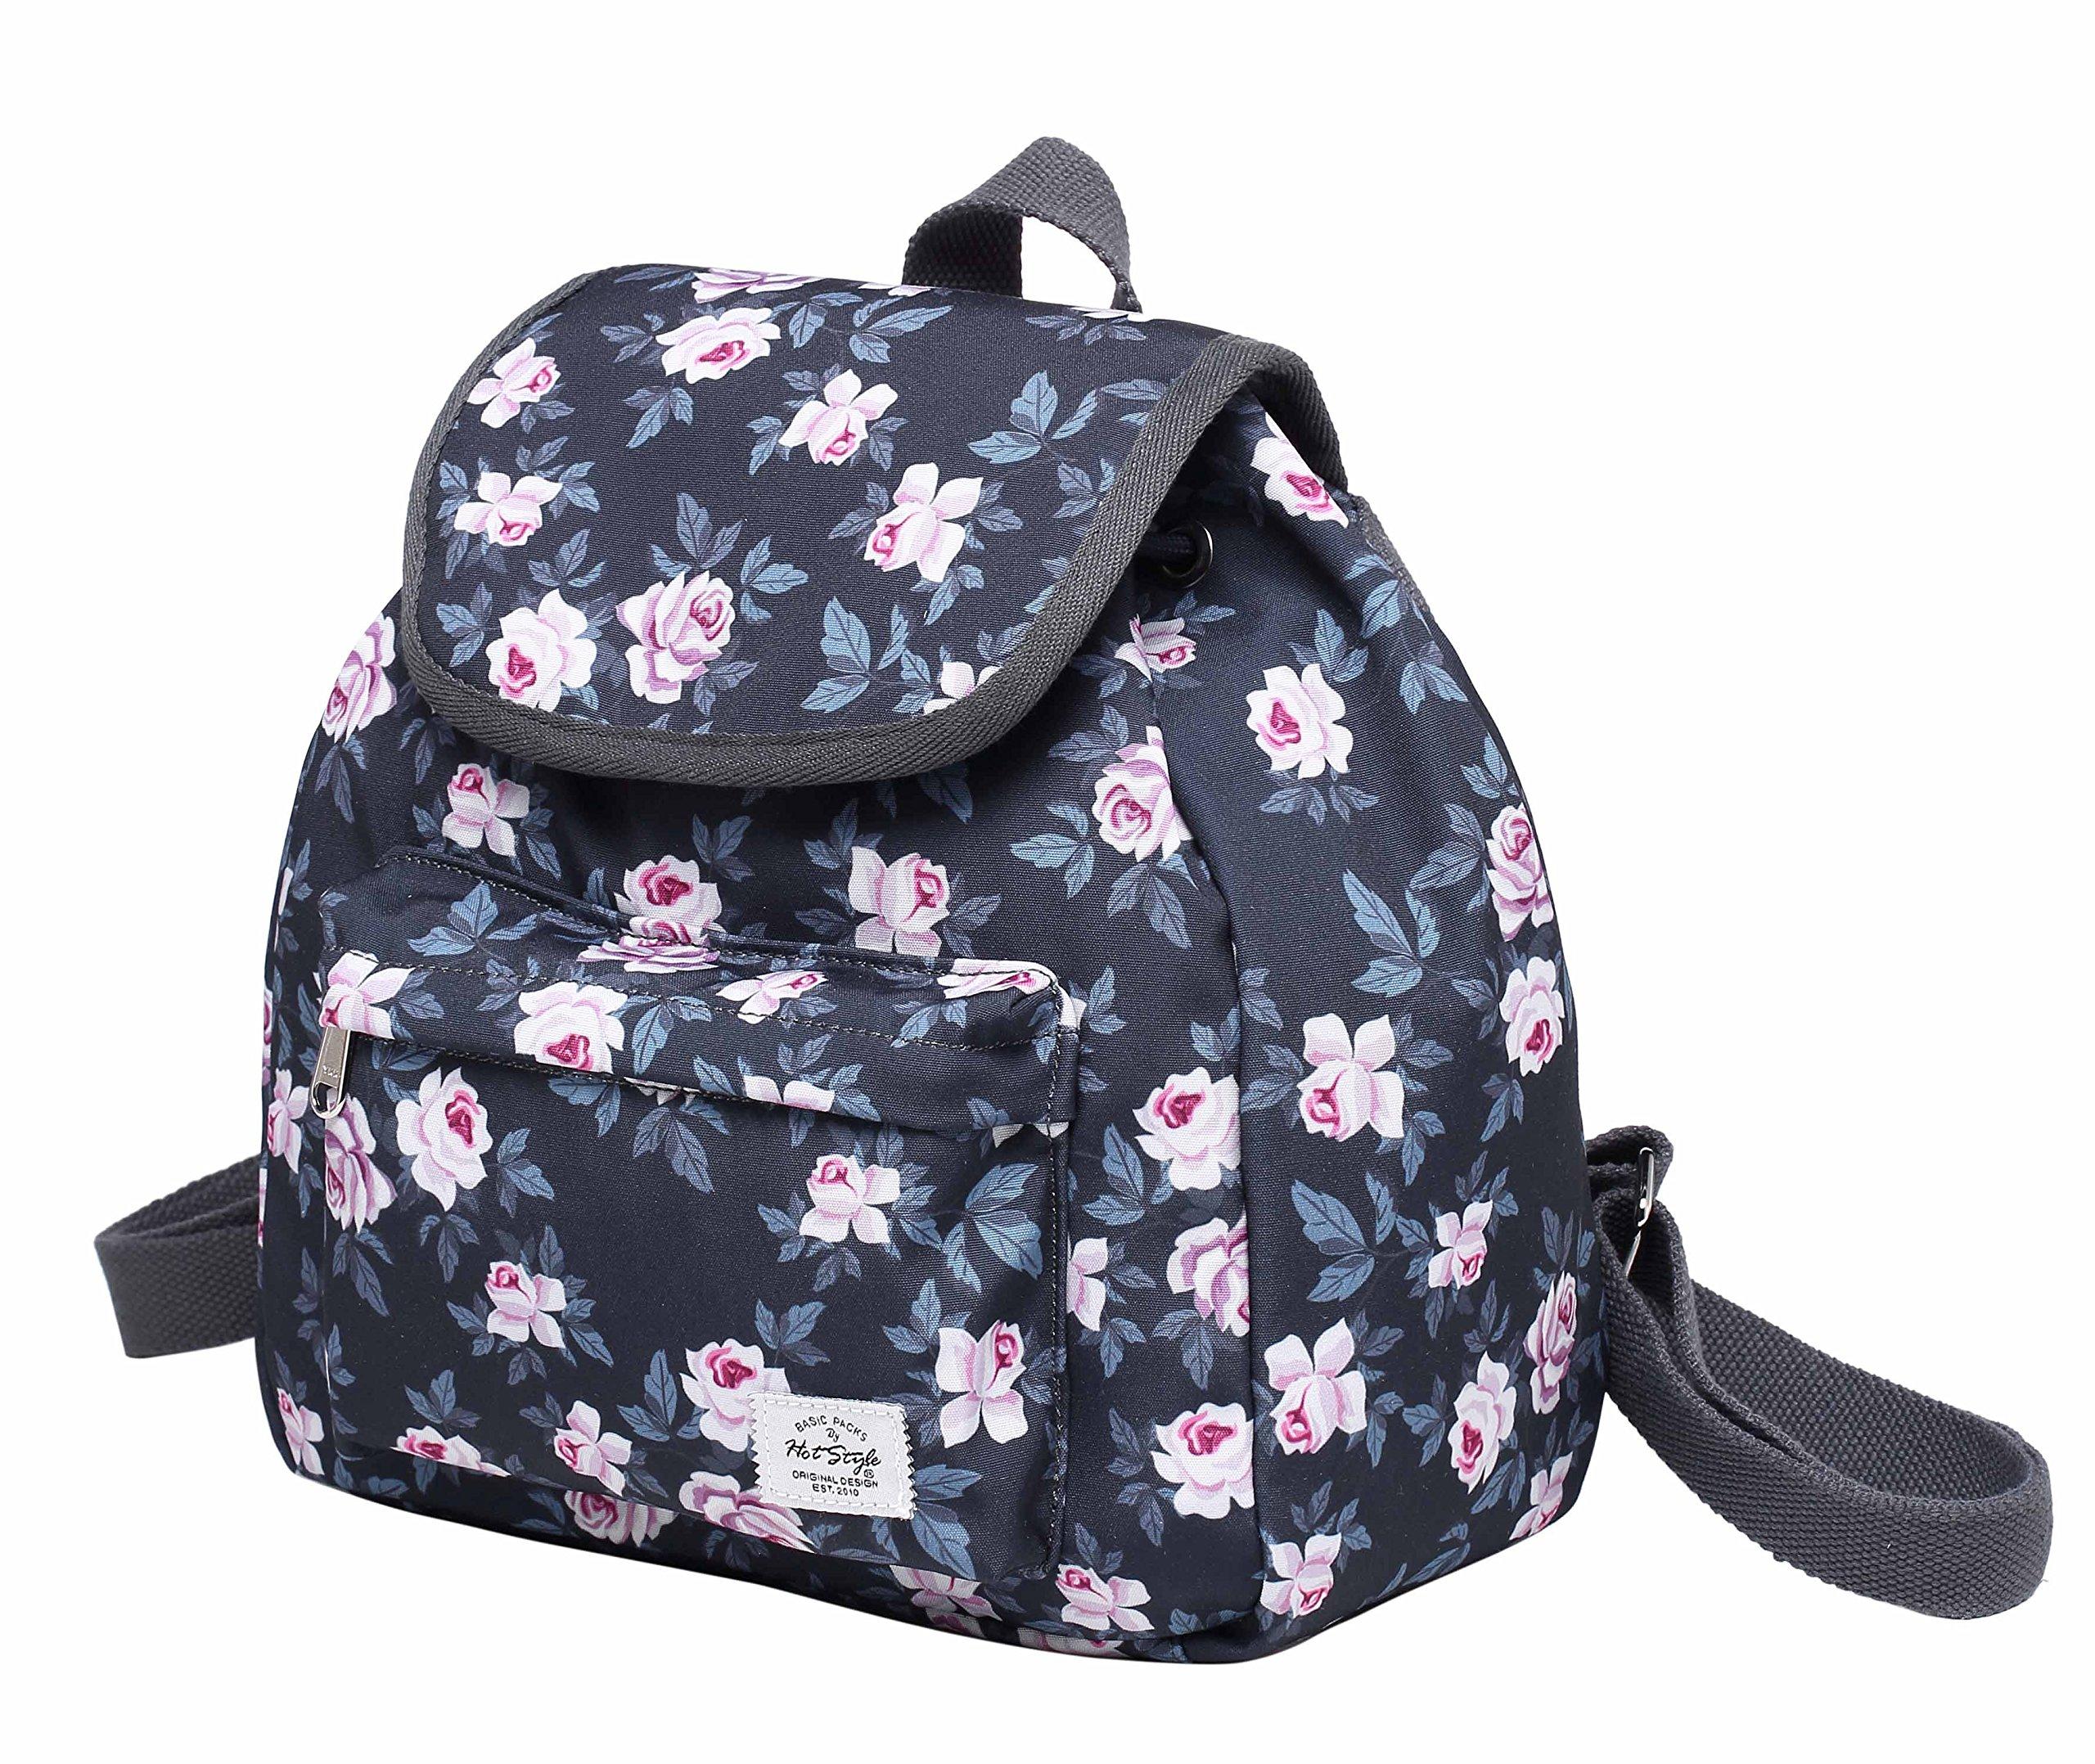 MIETTE Small Backpack Purse Flap Bag   Fits iPad Mini   11''x9.8''x5.1   Grey Roses